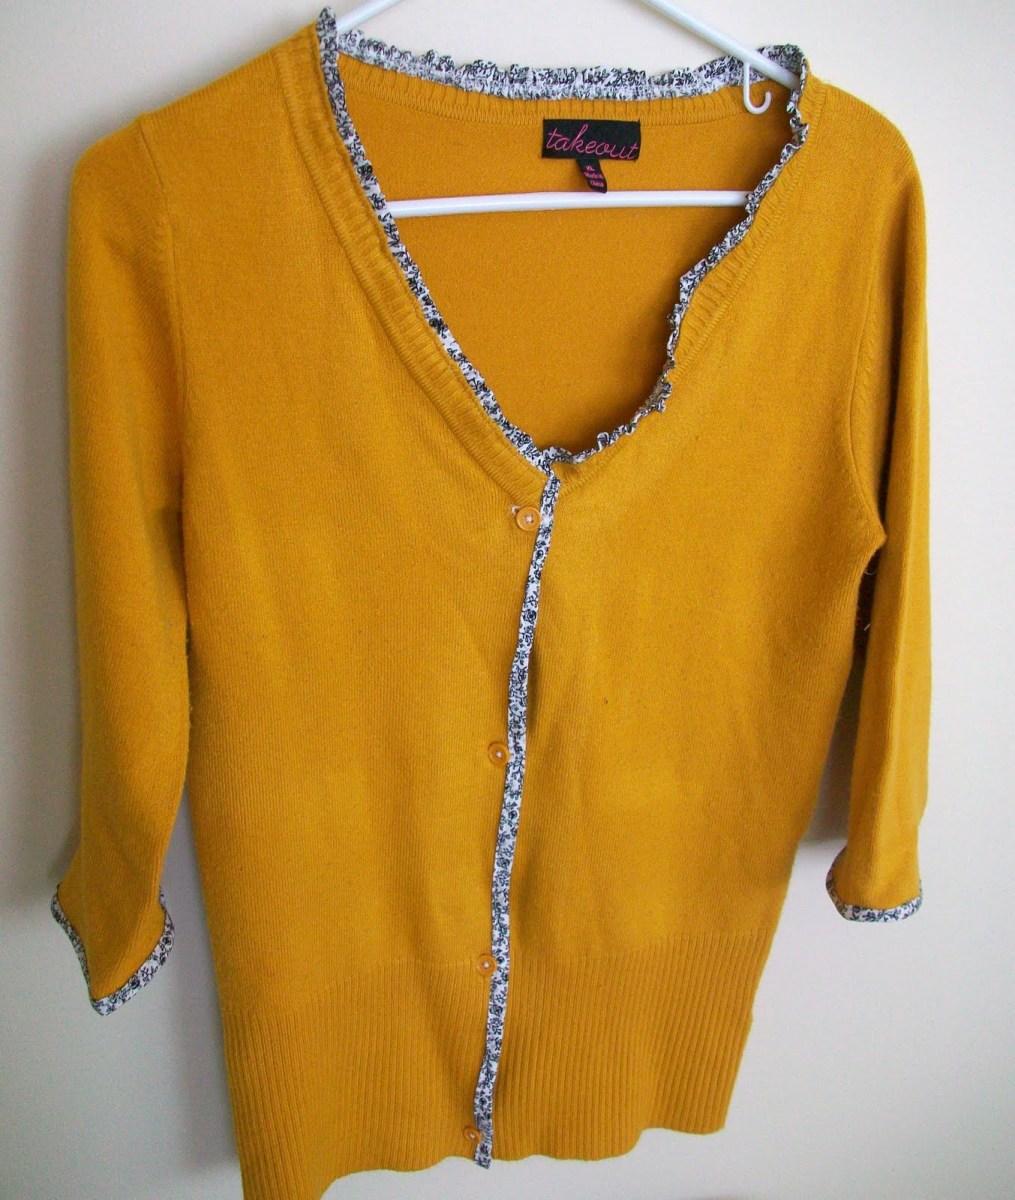 Cardigan Pattern Sewing Diy Sweater To Cardigan Refashion Tutorial Heather Handmade